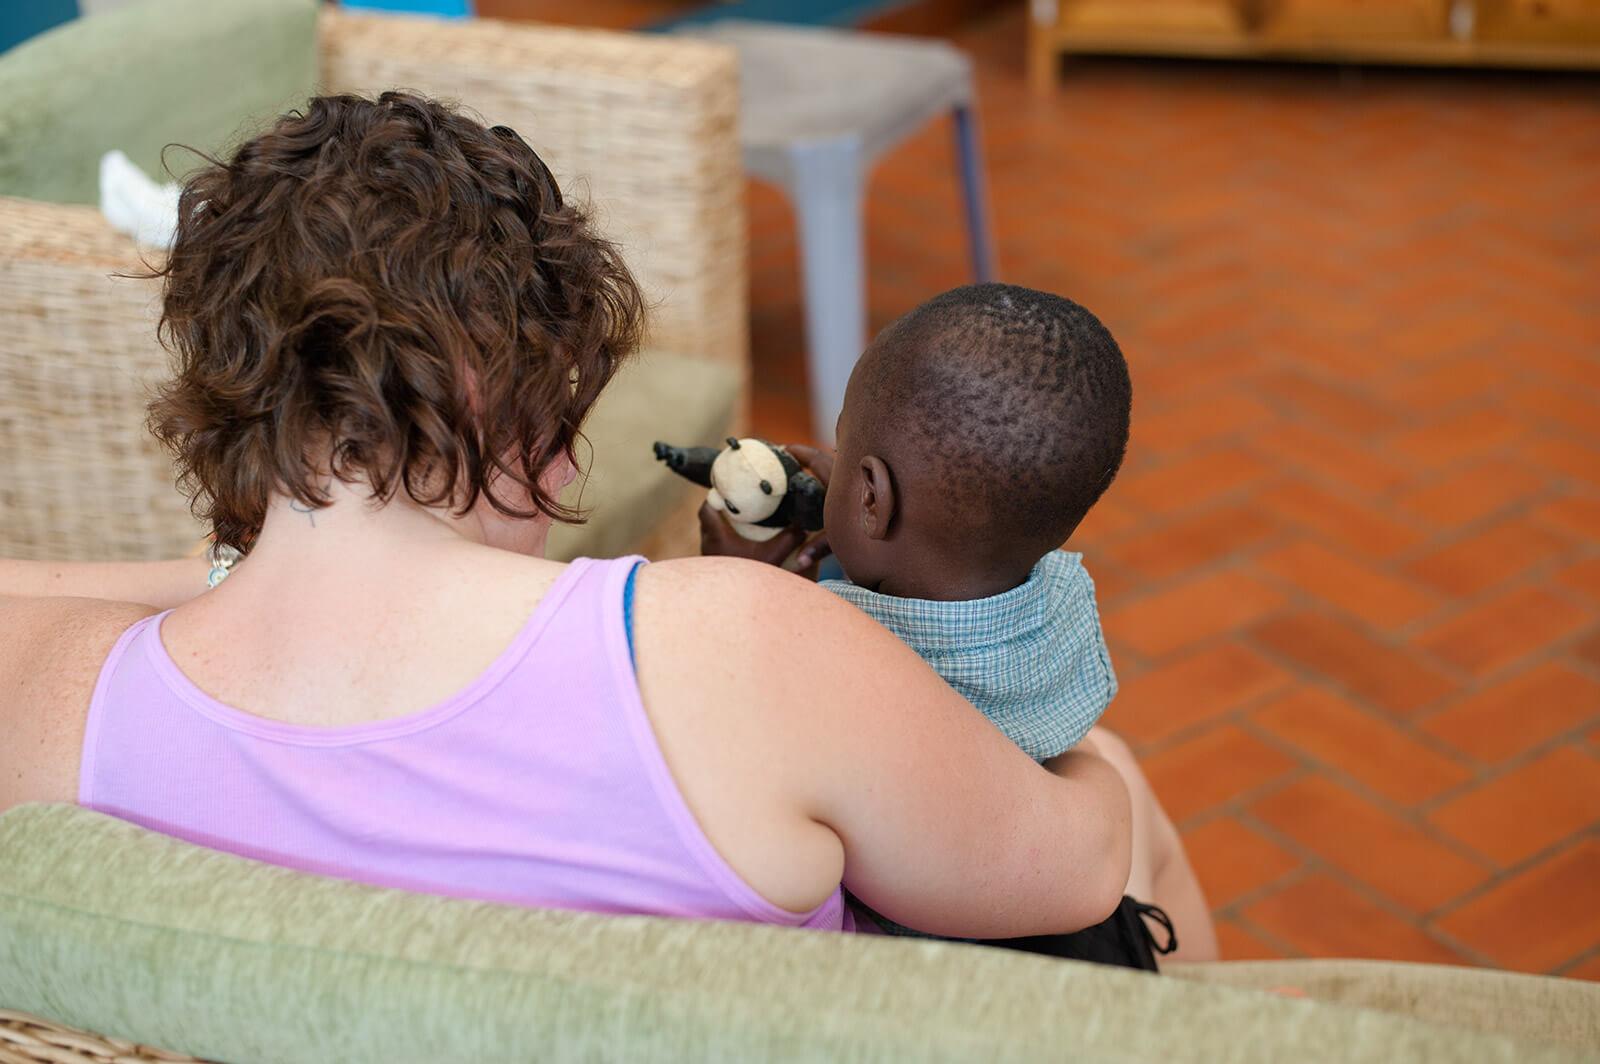 Regina Photographer - In Uganda - Thank God for Watoto